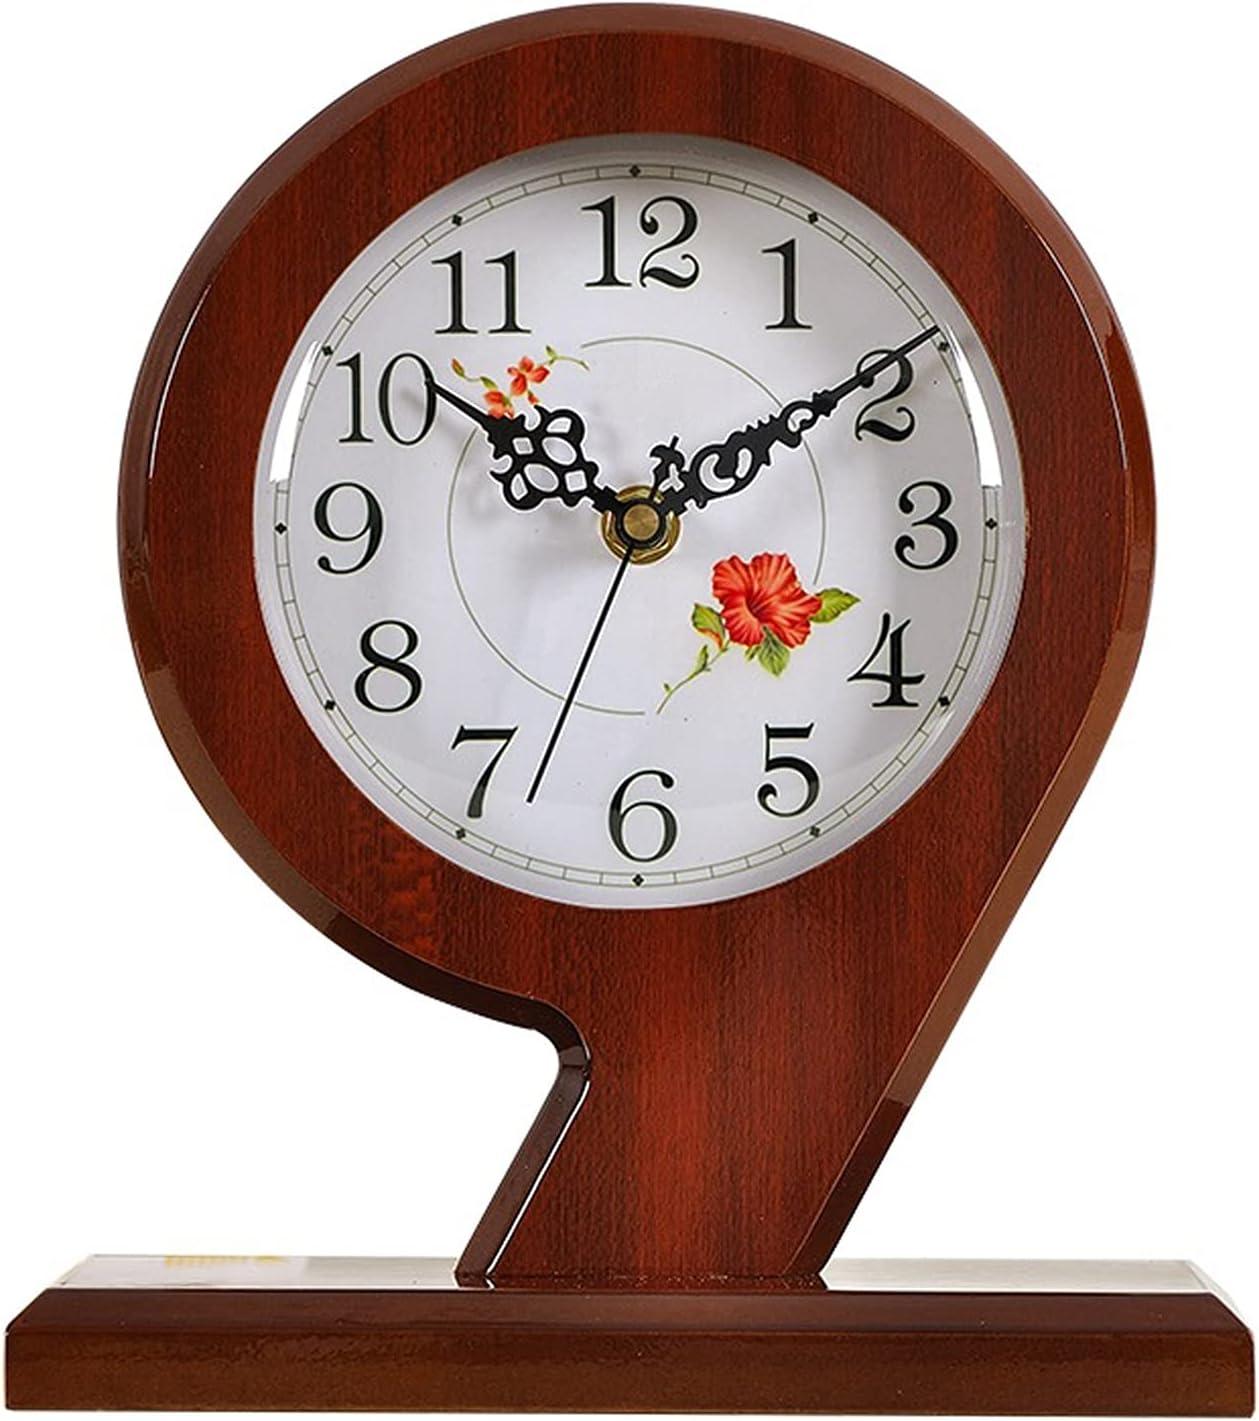 jinrun Relojes de Escritorio Reloj Reloj Moderno silencioso Escritorio Reloj Sala de Estar Tablero Reloj Escritorio péndulo Reloj Sentado Reloj casa Reloj de Reloj Despertador